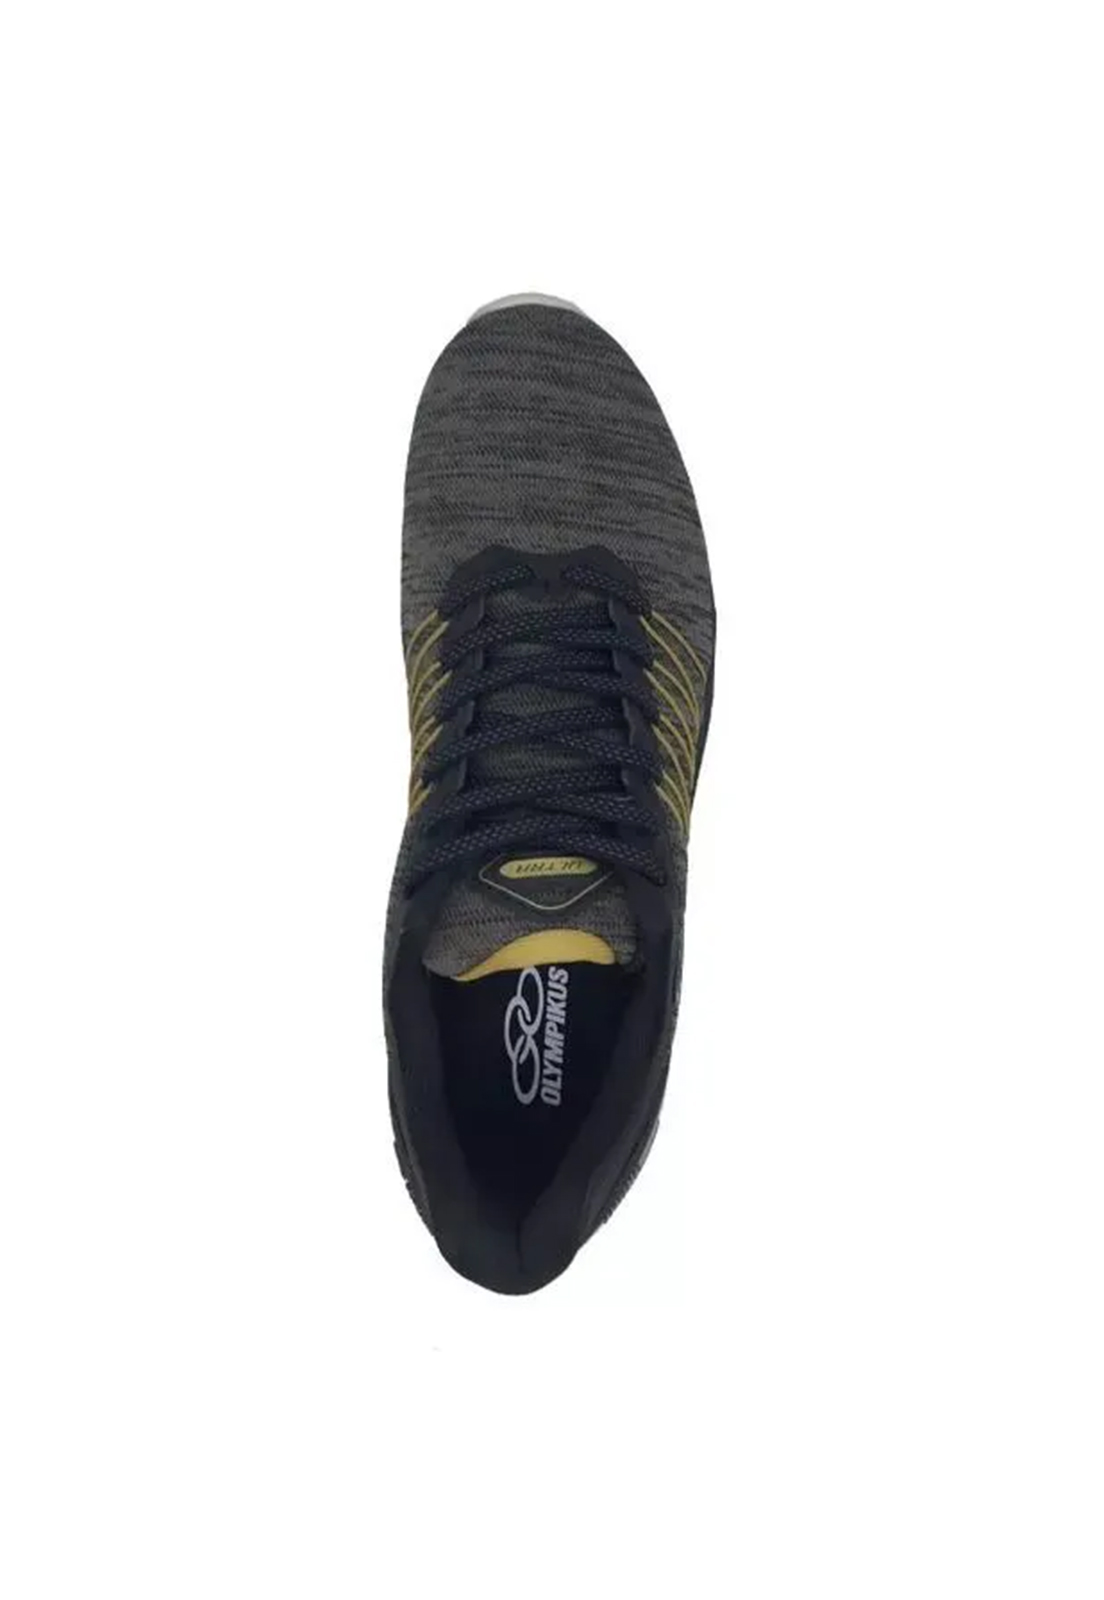 Tênis Olympikus Ultra - Masculino - Preto/dourado